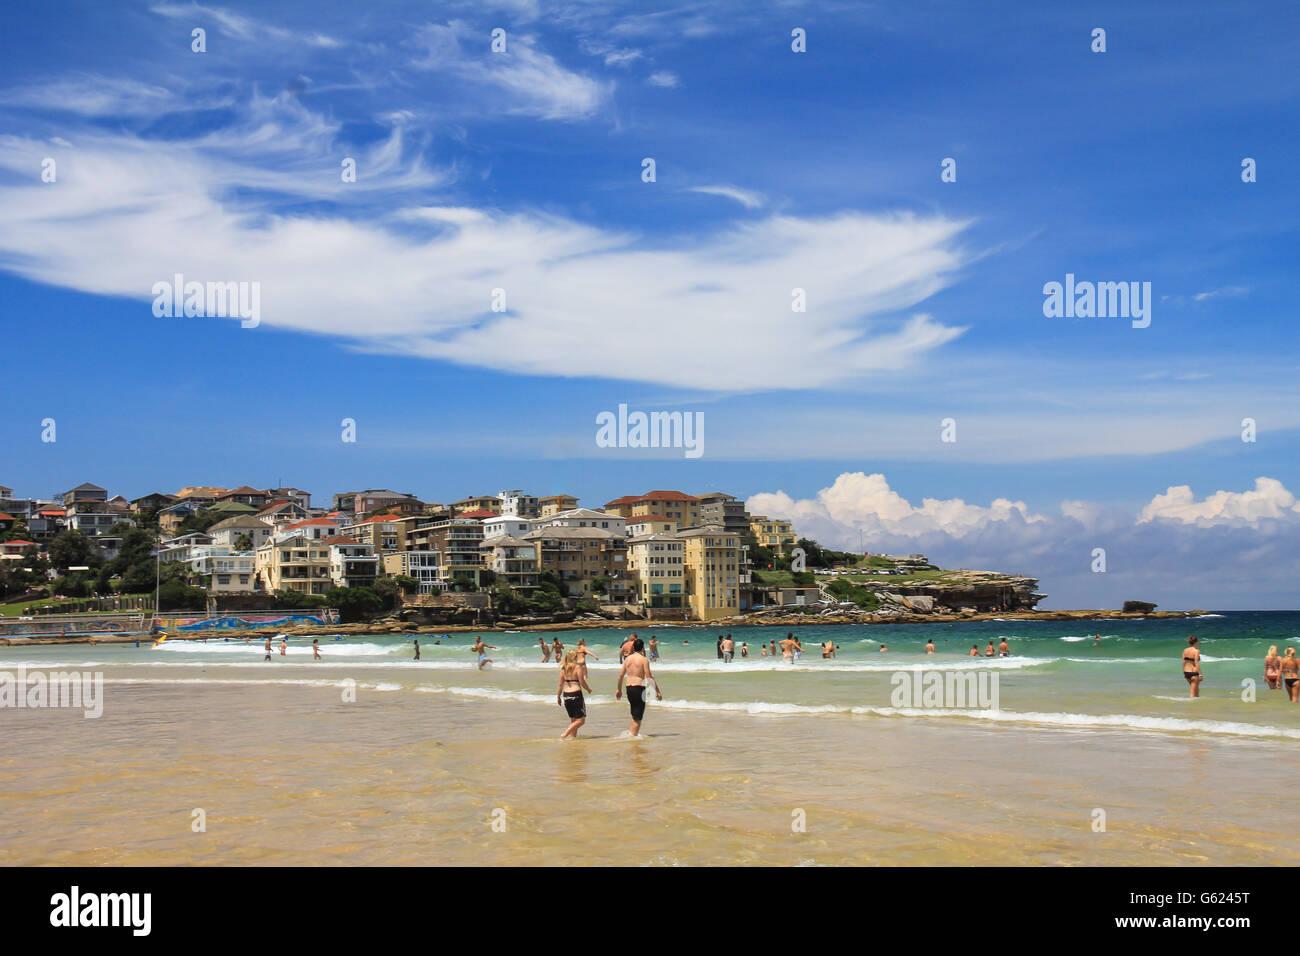 Nice view of Bondi Beach in Sydney australia Stock Photo